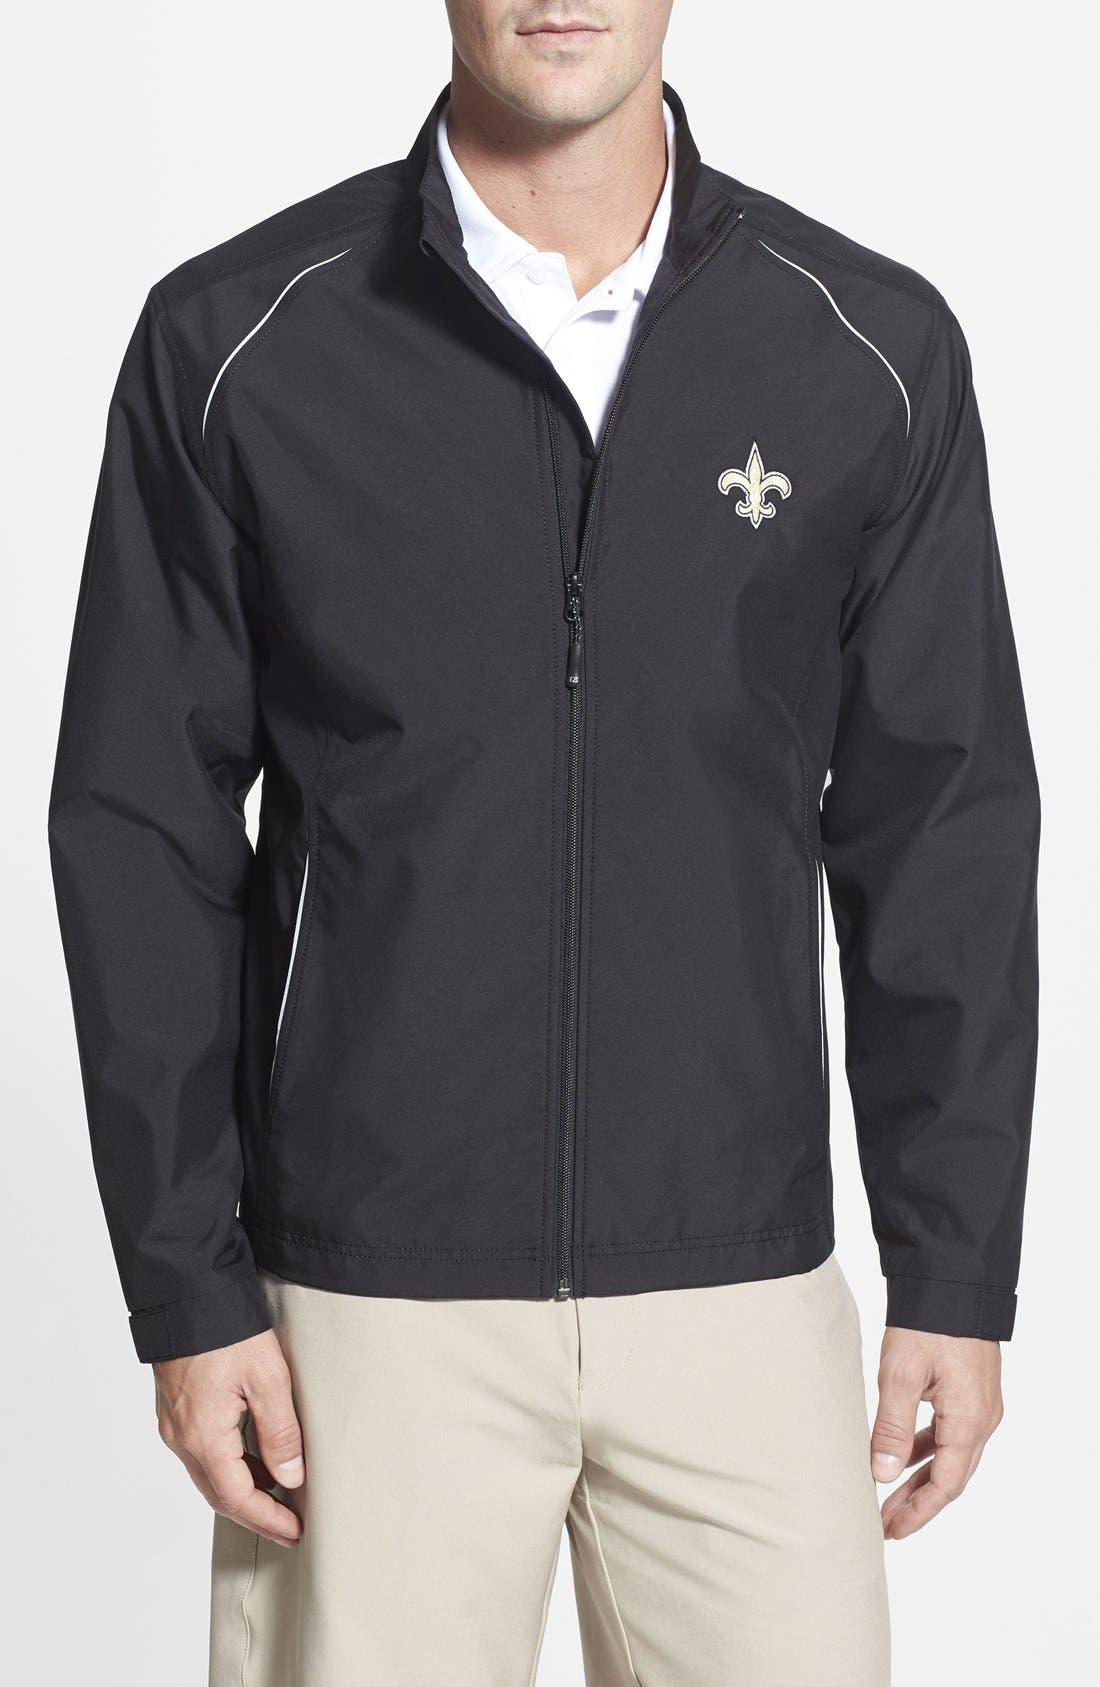 New Orleans Saints - Beacon WeatherTec Wind & Water Resistant Jacket,                         Main,                         color, 001